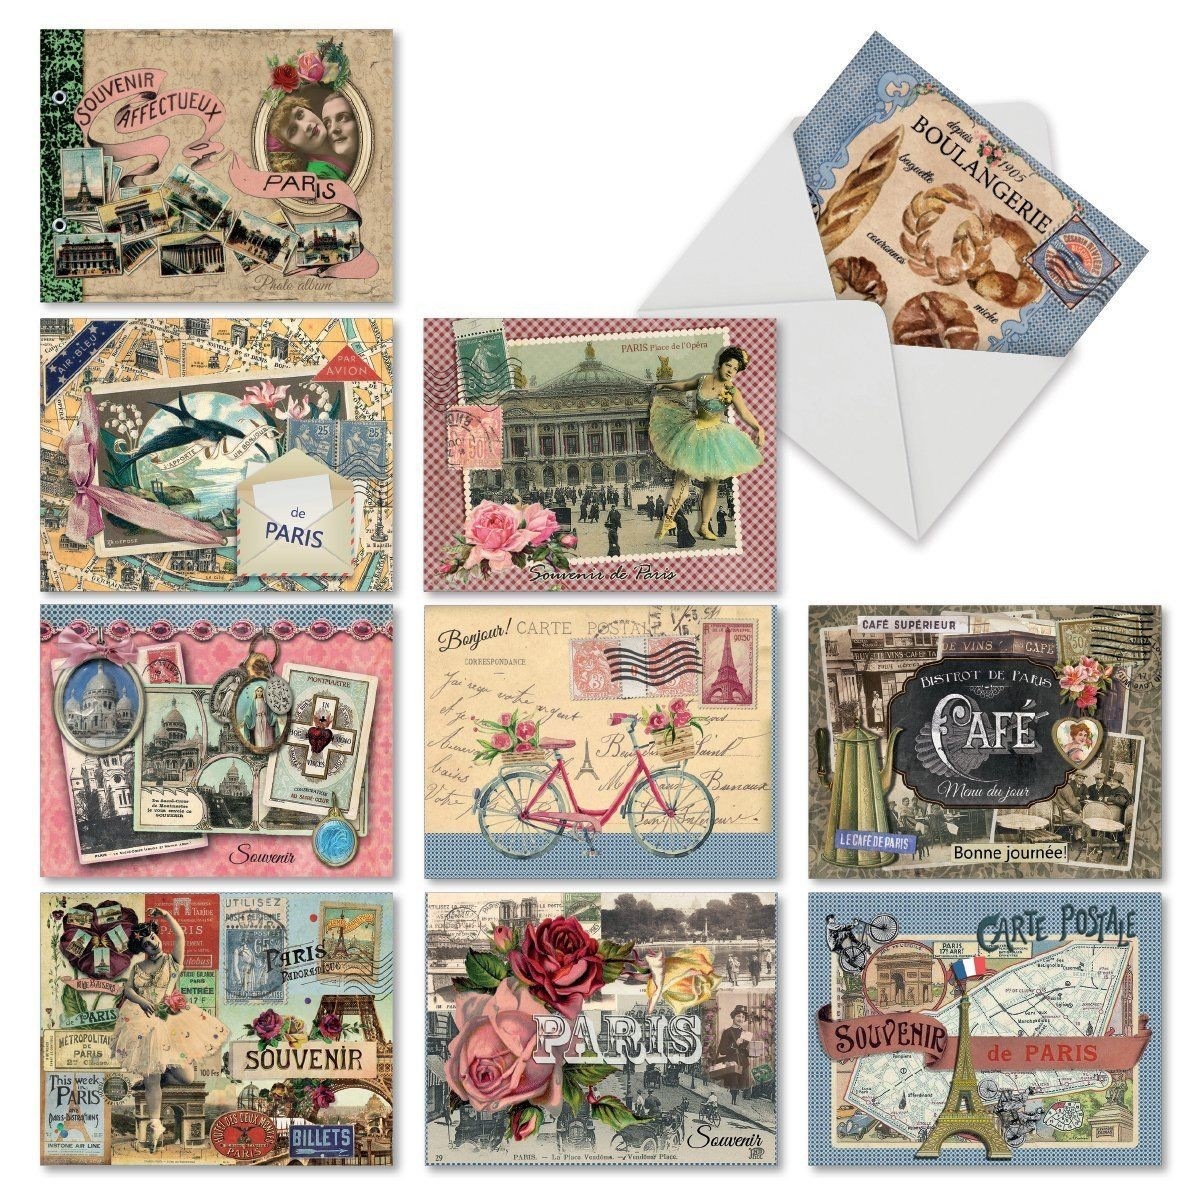 Amazon Papercraft Amazon M6624ocbsl Papiers De Paris 10 assorted Blank All